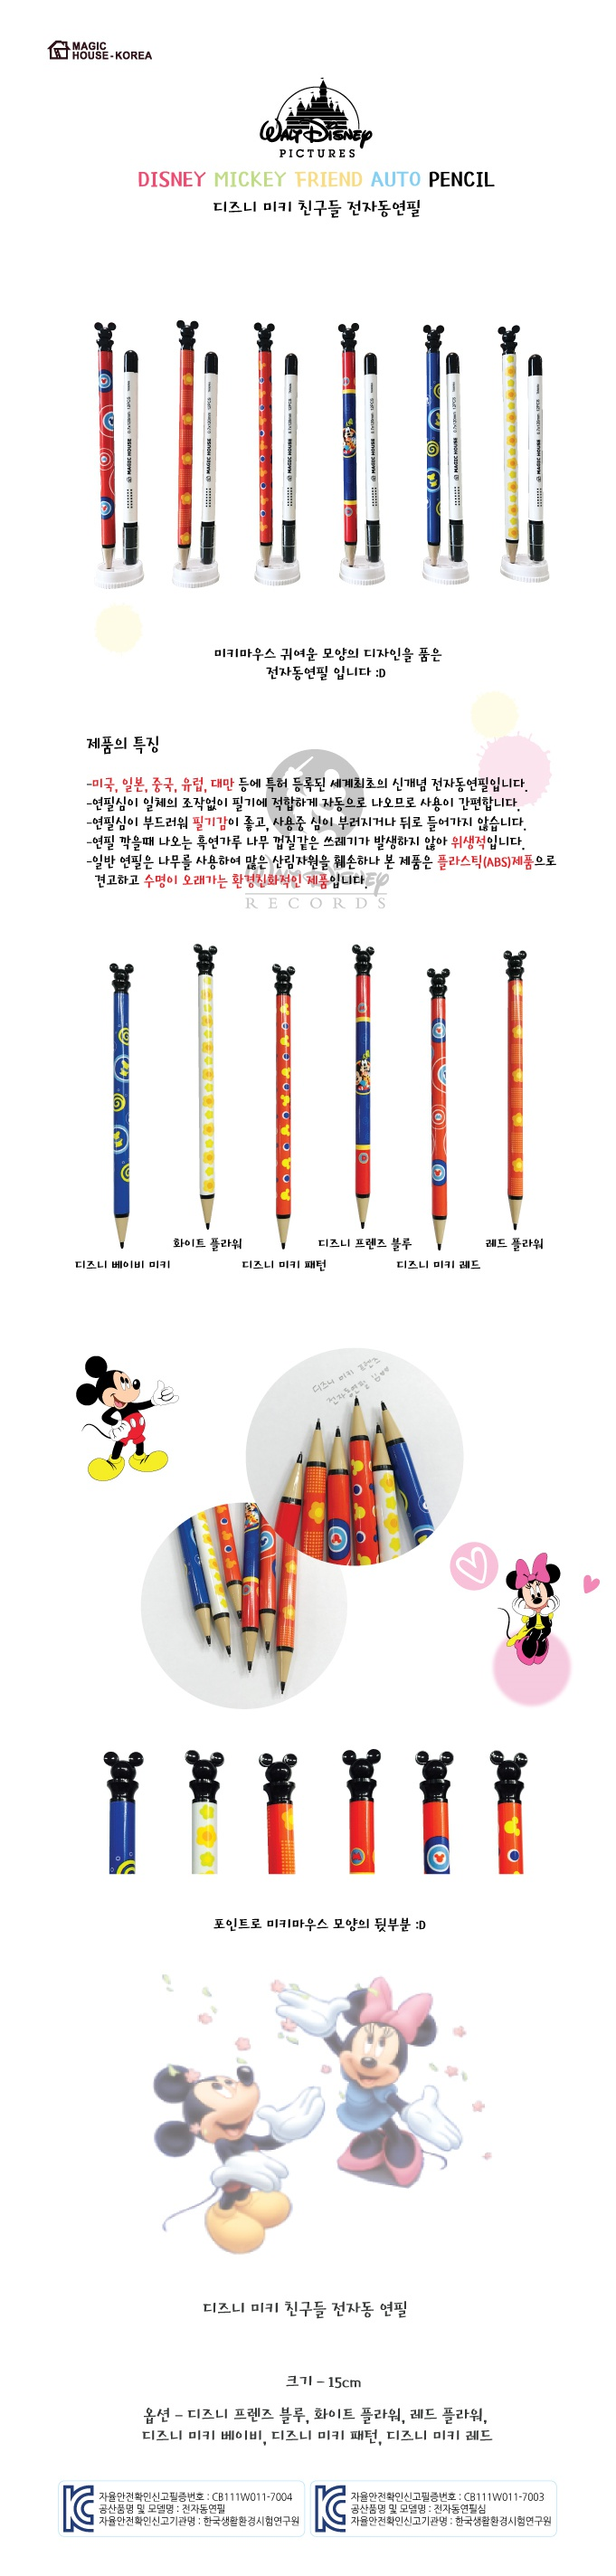 0.7mm 디즈니컬러전자동연필 (랜덤)5,000원-킹콩박스디자인문구, 필기류, 연필, 자동/기능성연필바보사랑0.7mm 디즈니컬러전자동연필 (랜덤)5,000원-킹콩박스디자인문구, 필기류, 연필, 자동/기능성연필바보사랑